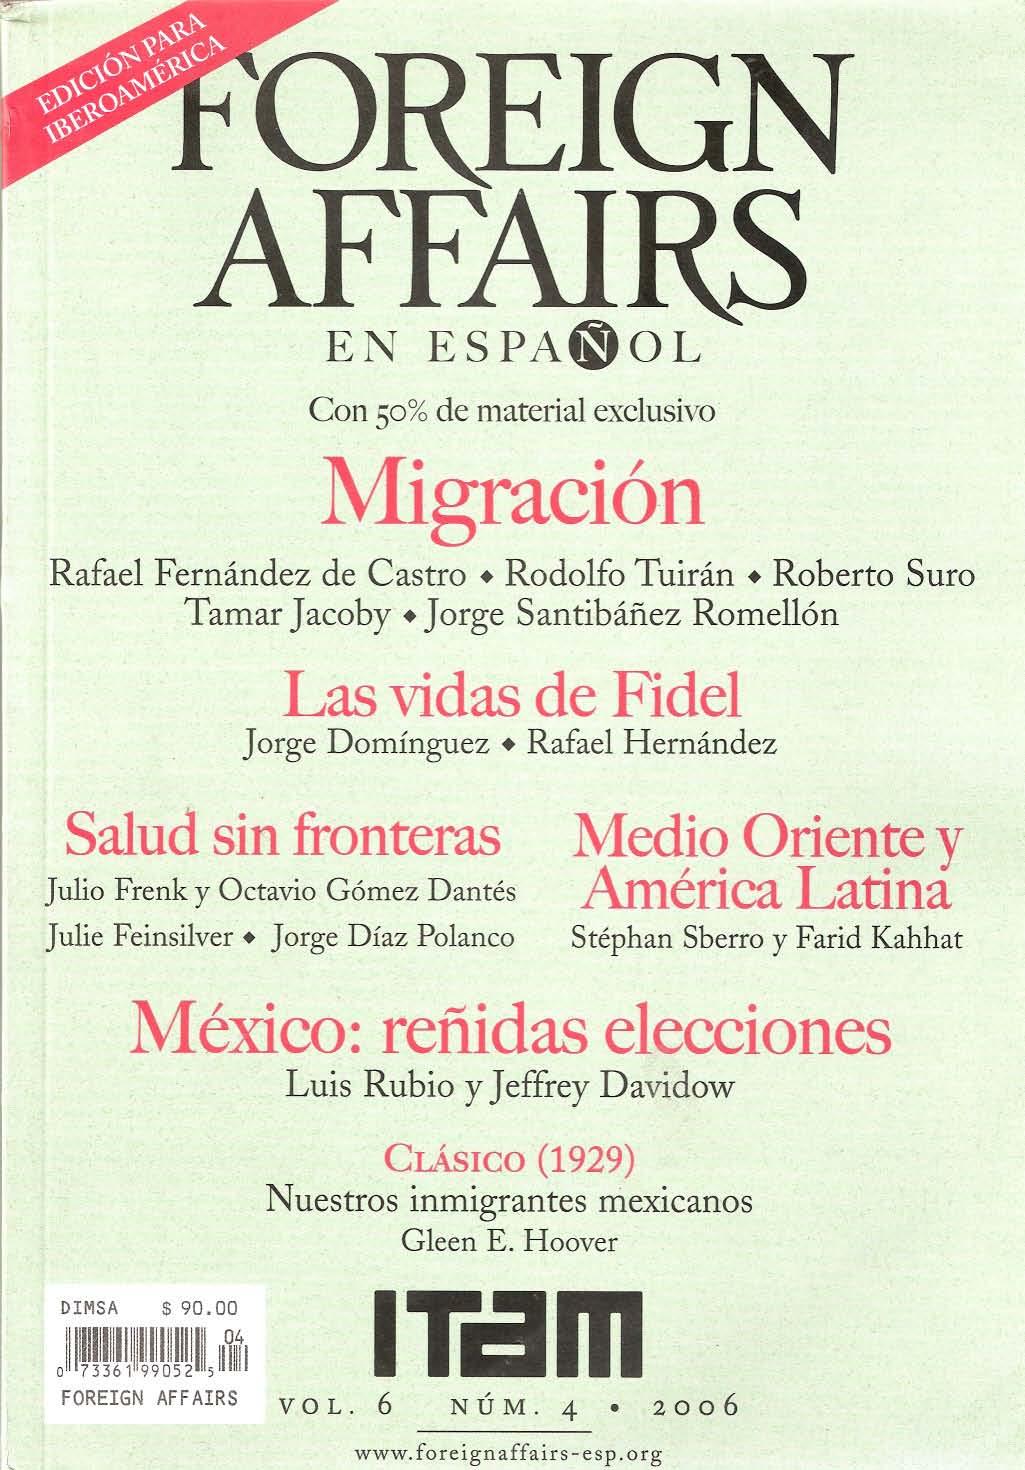 FAL06-4